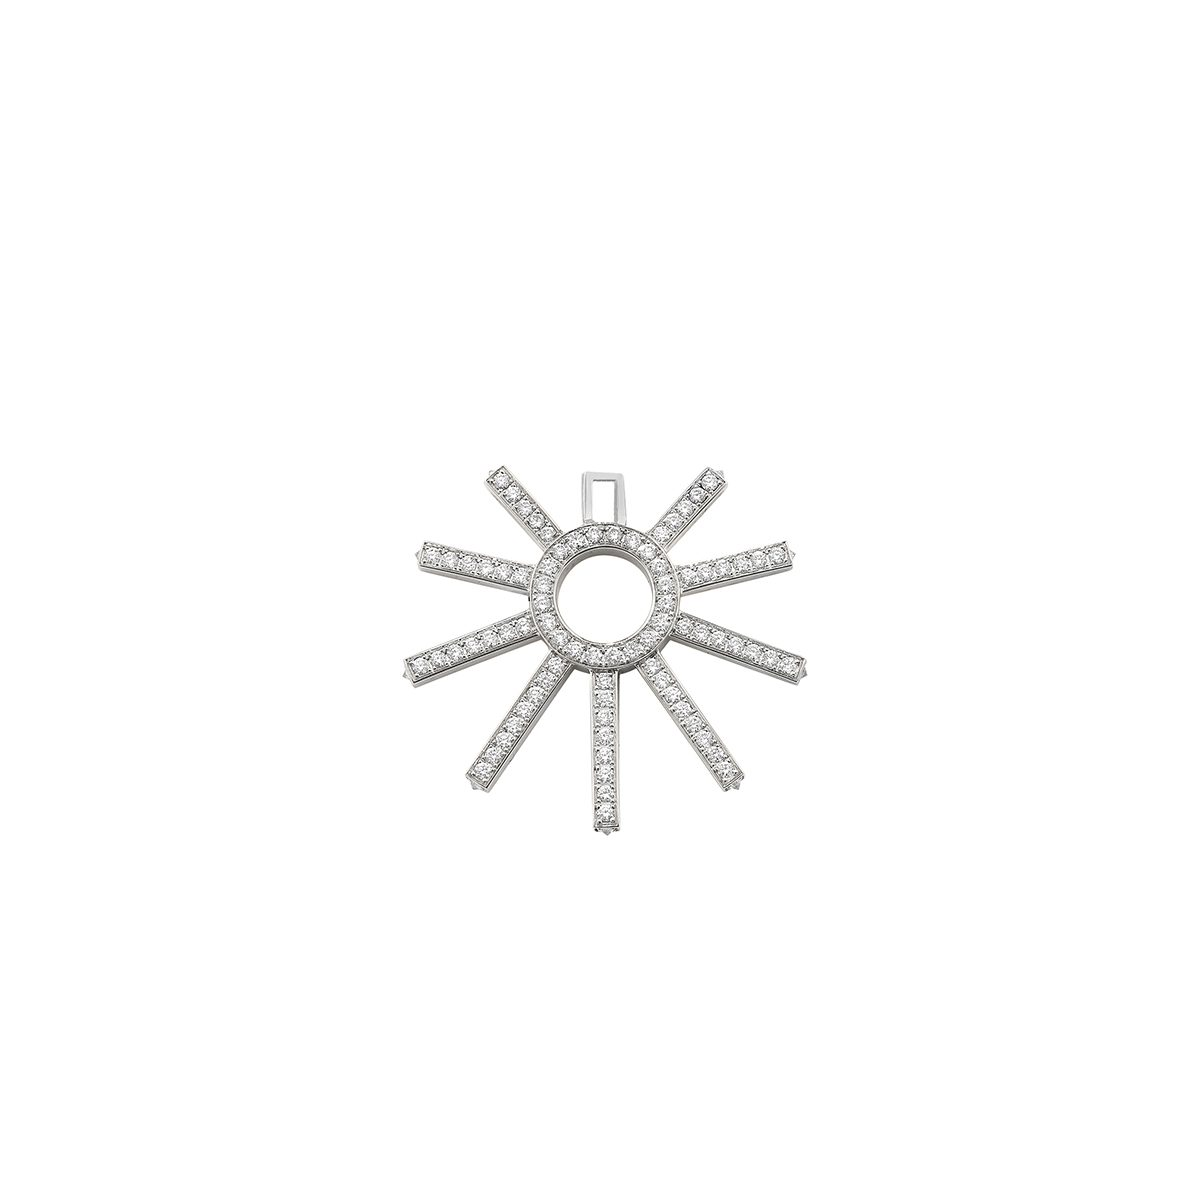 Sun-Ray-Hero-charm-WG-diamond